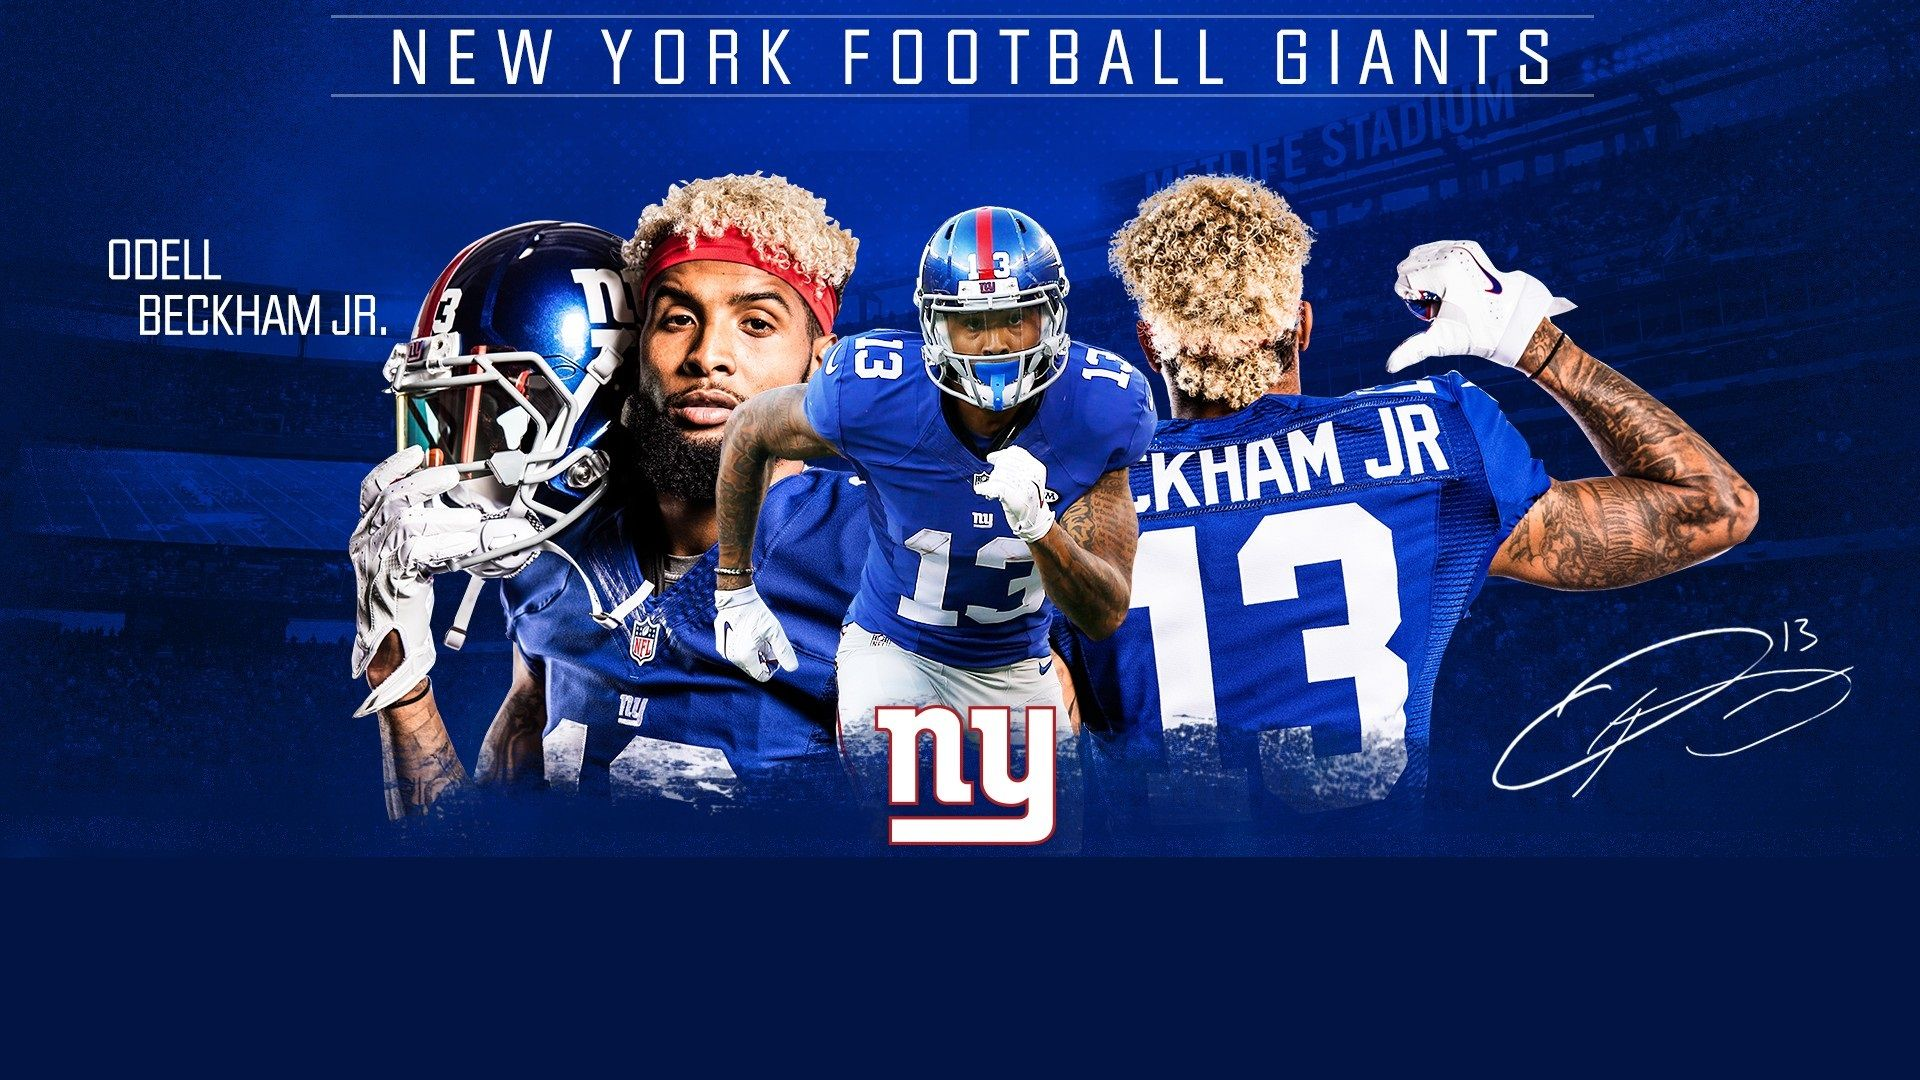 HD Desktop Wallpaper New York Giants Odell beckham jr